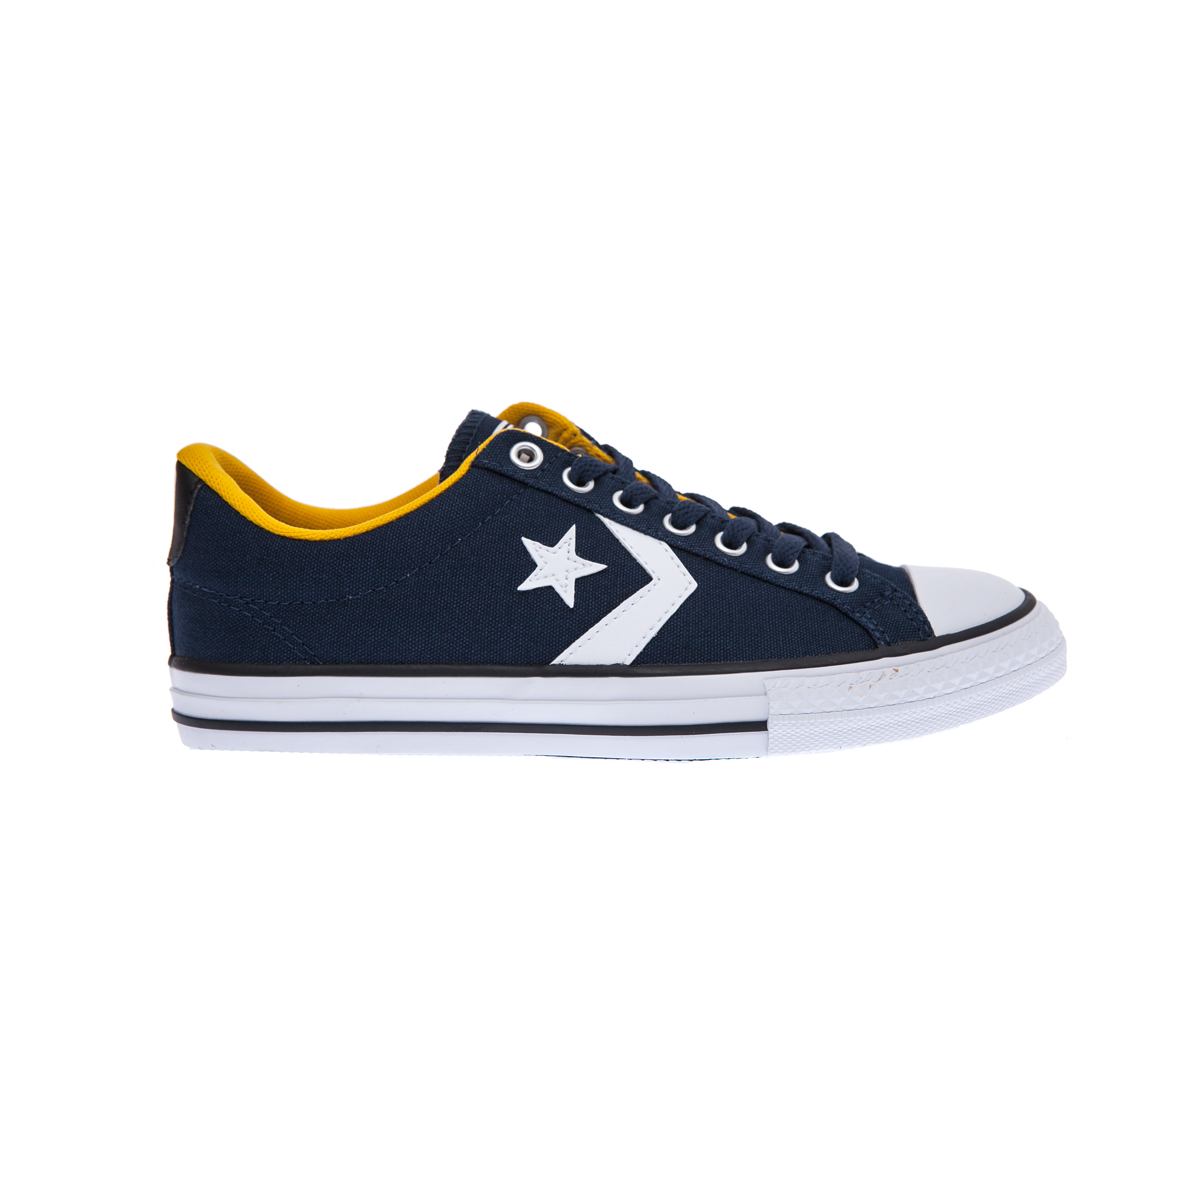 CONVERSE – Παιδικά παπούτσια Star Player EV Ox μπλε